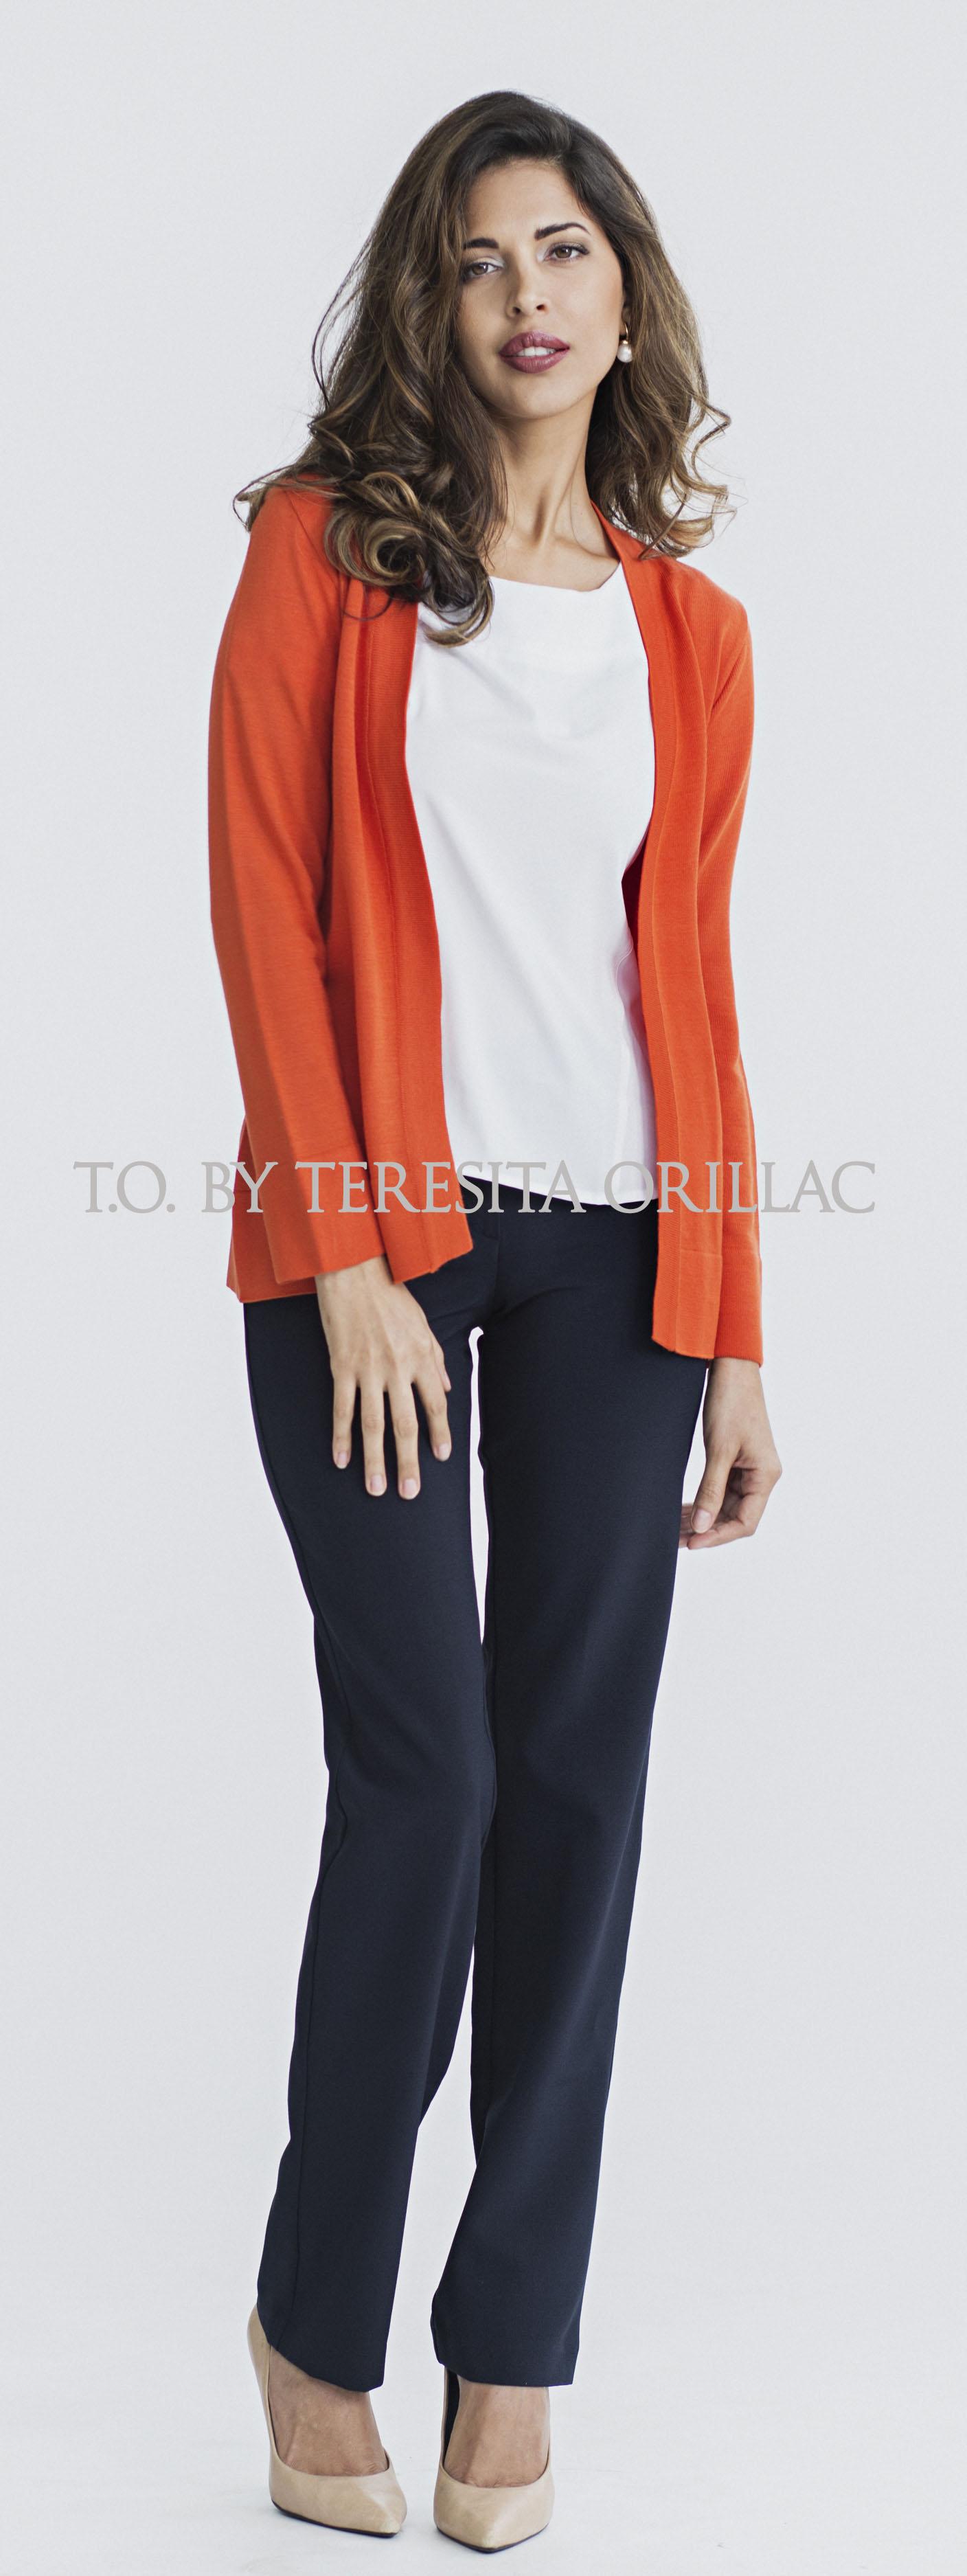 Uniformes panama ropa ejecutiva 12.jpg